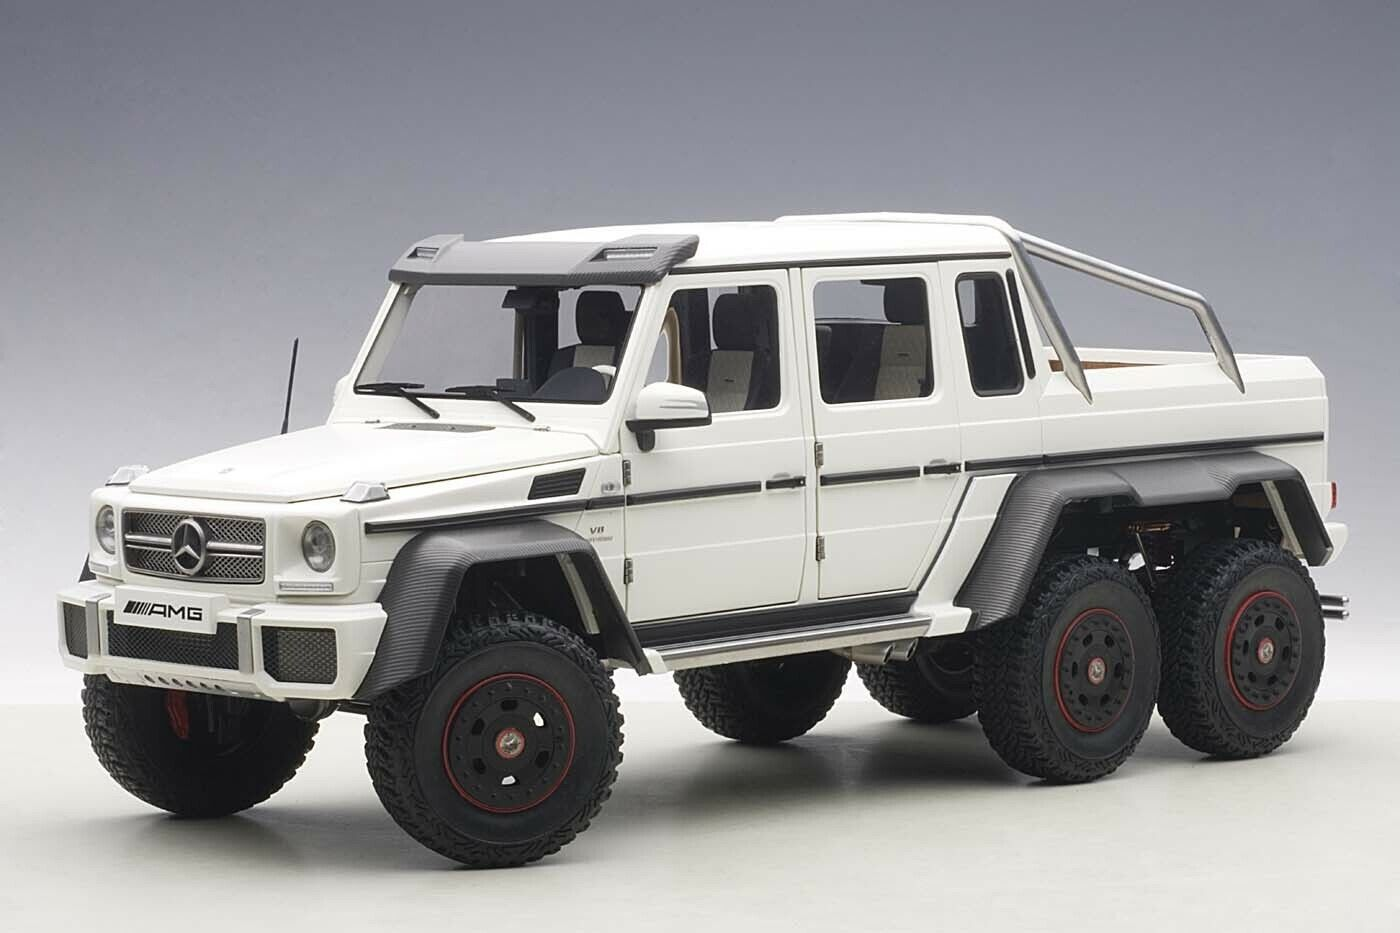 Autoart Mercedes-Benz g63 AMG 6x6 MAT blanc 2013 1 18